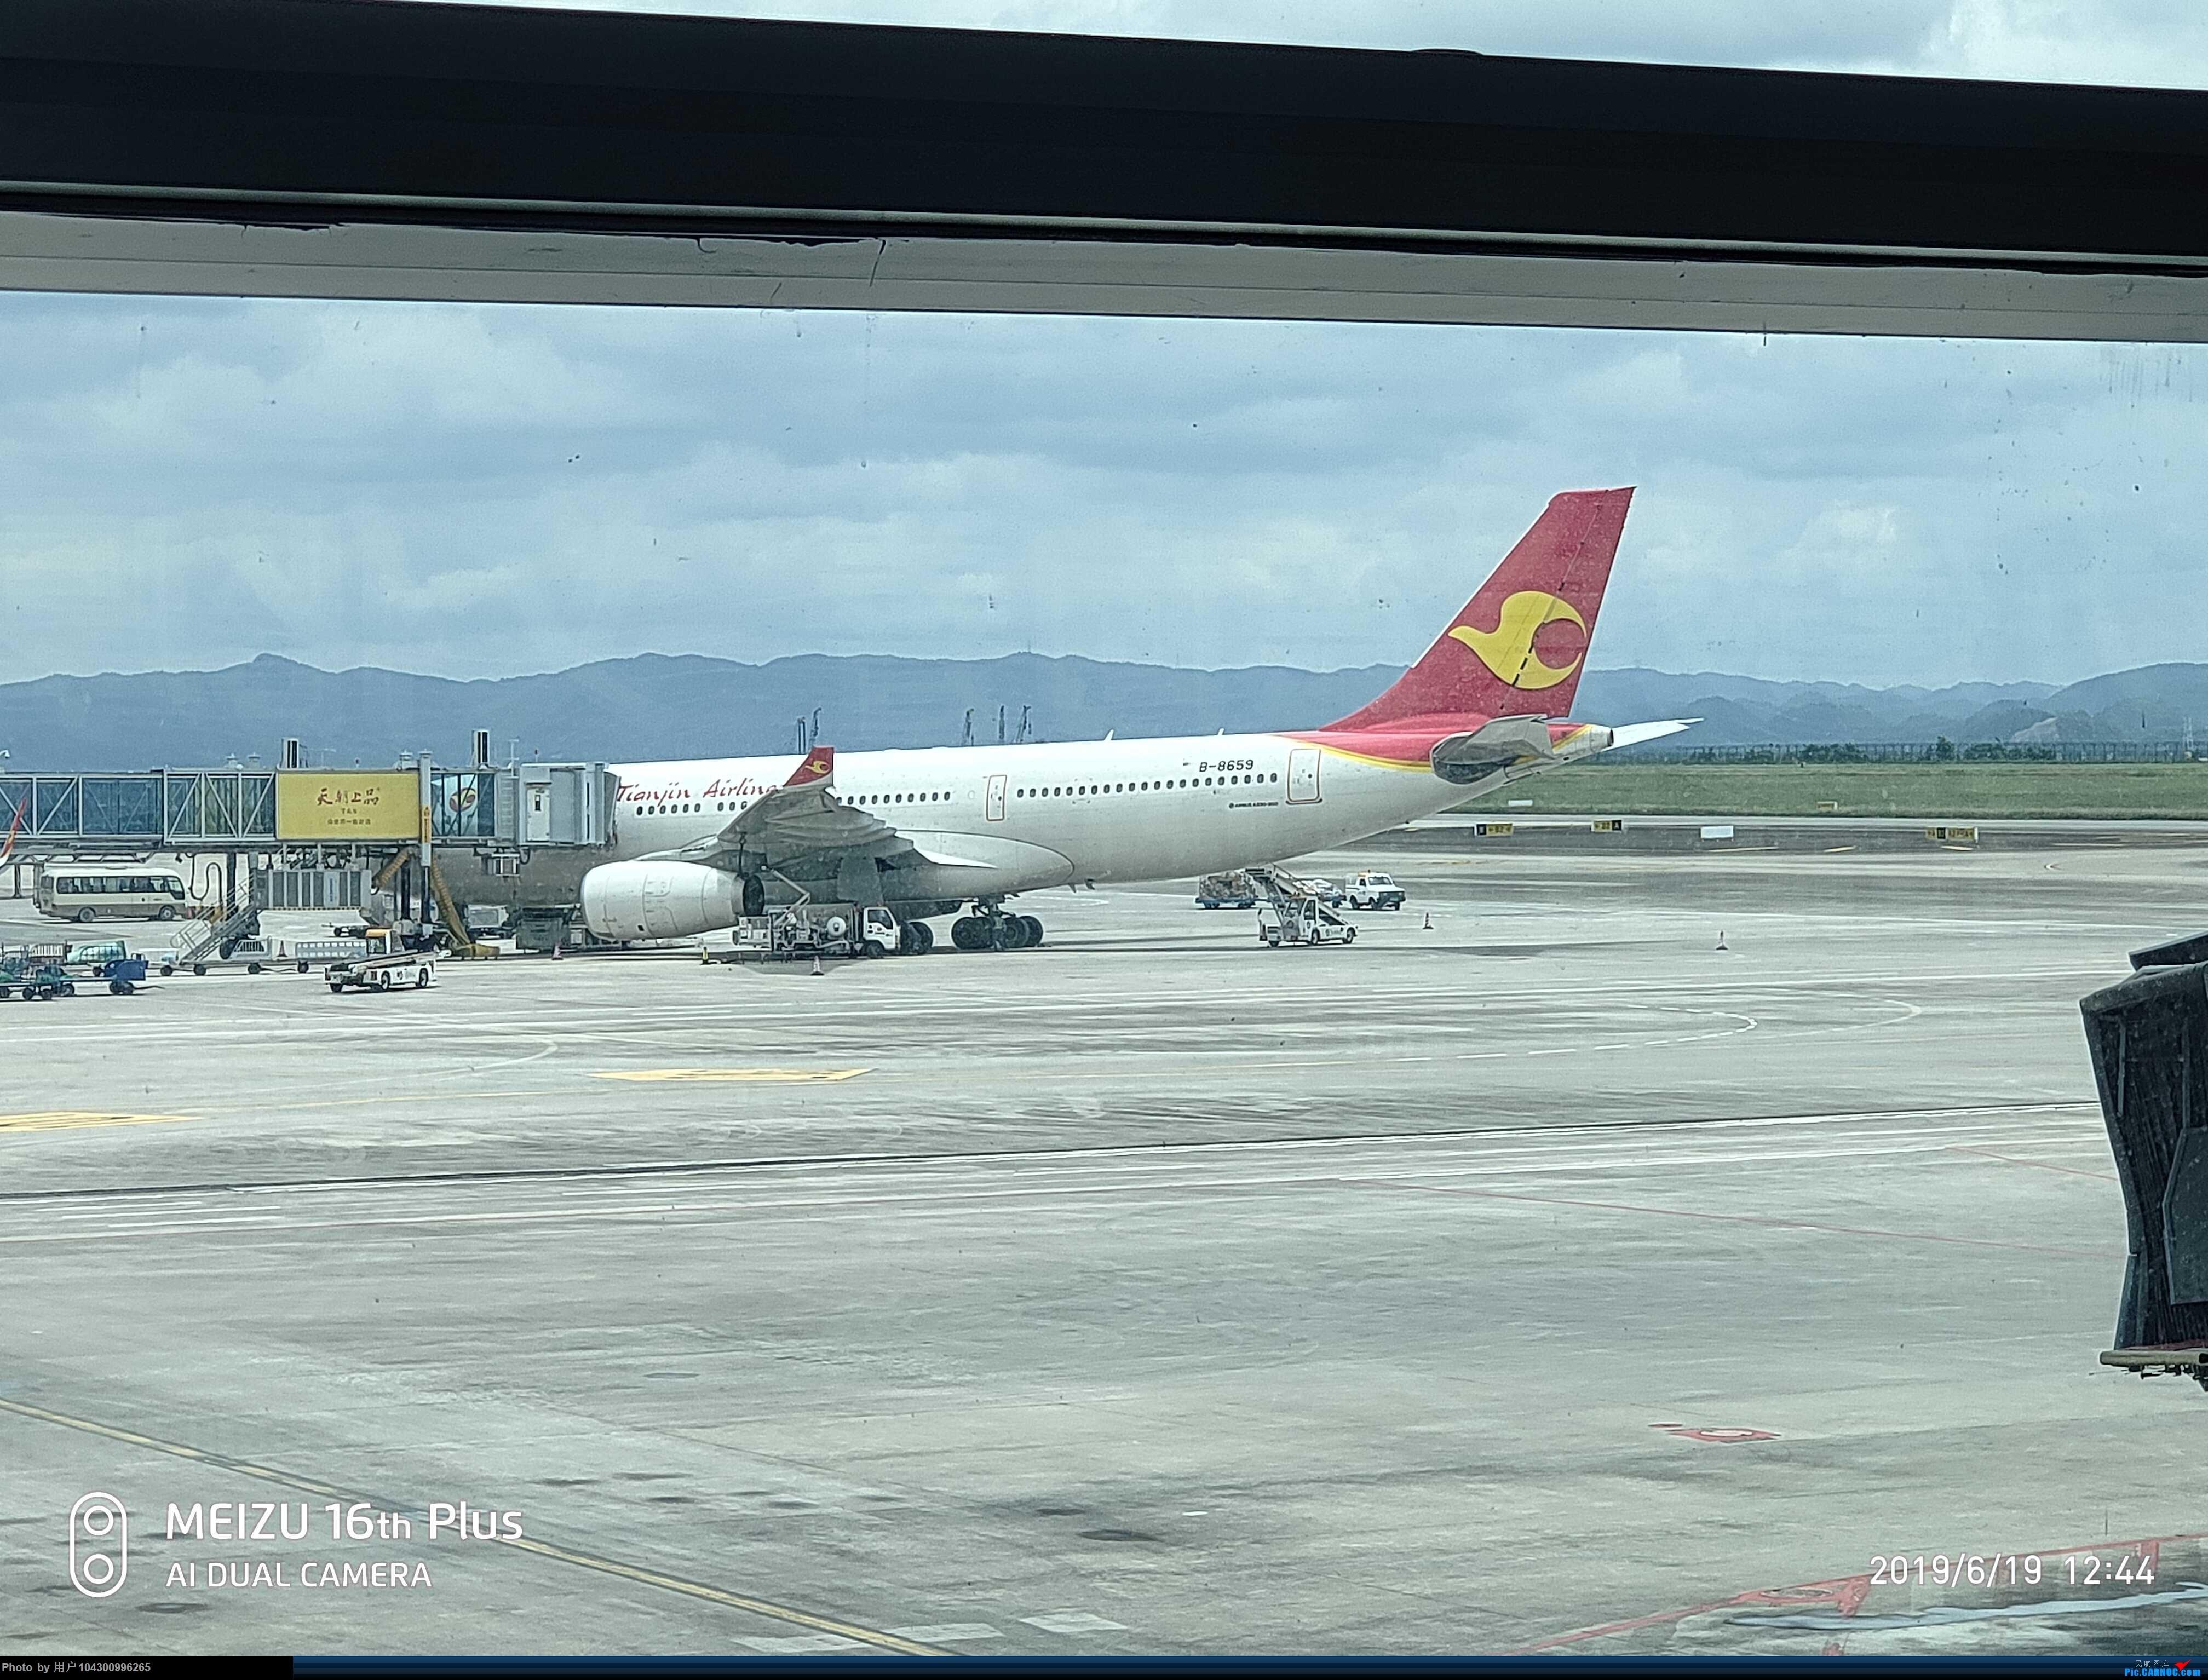 Re:[原创]DM哥飞行游记--贵阳往返荔波2日游 AIRBUS A330-200 B-8659 中国贵阳龙洞堡国际机场